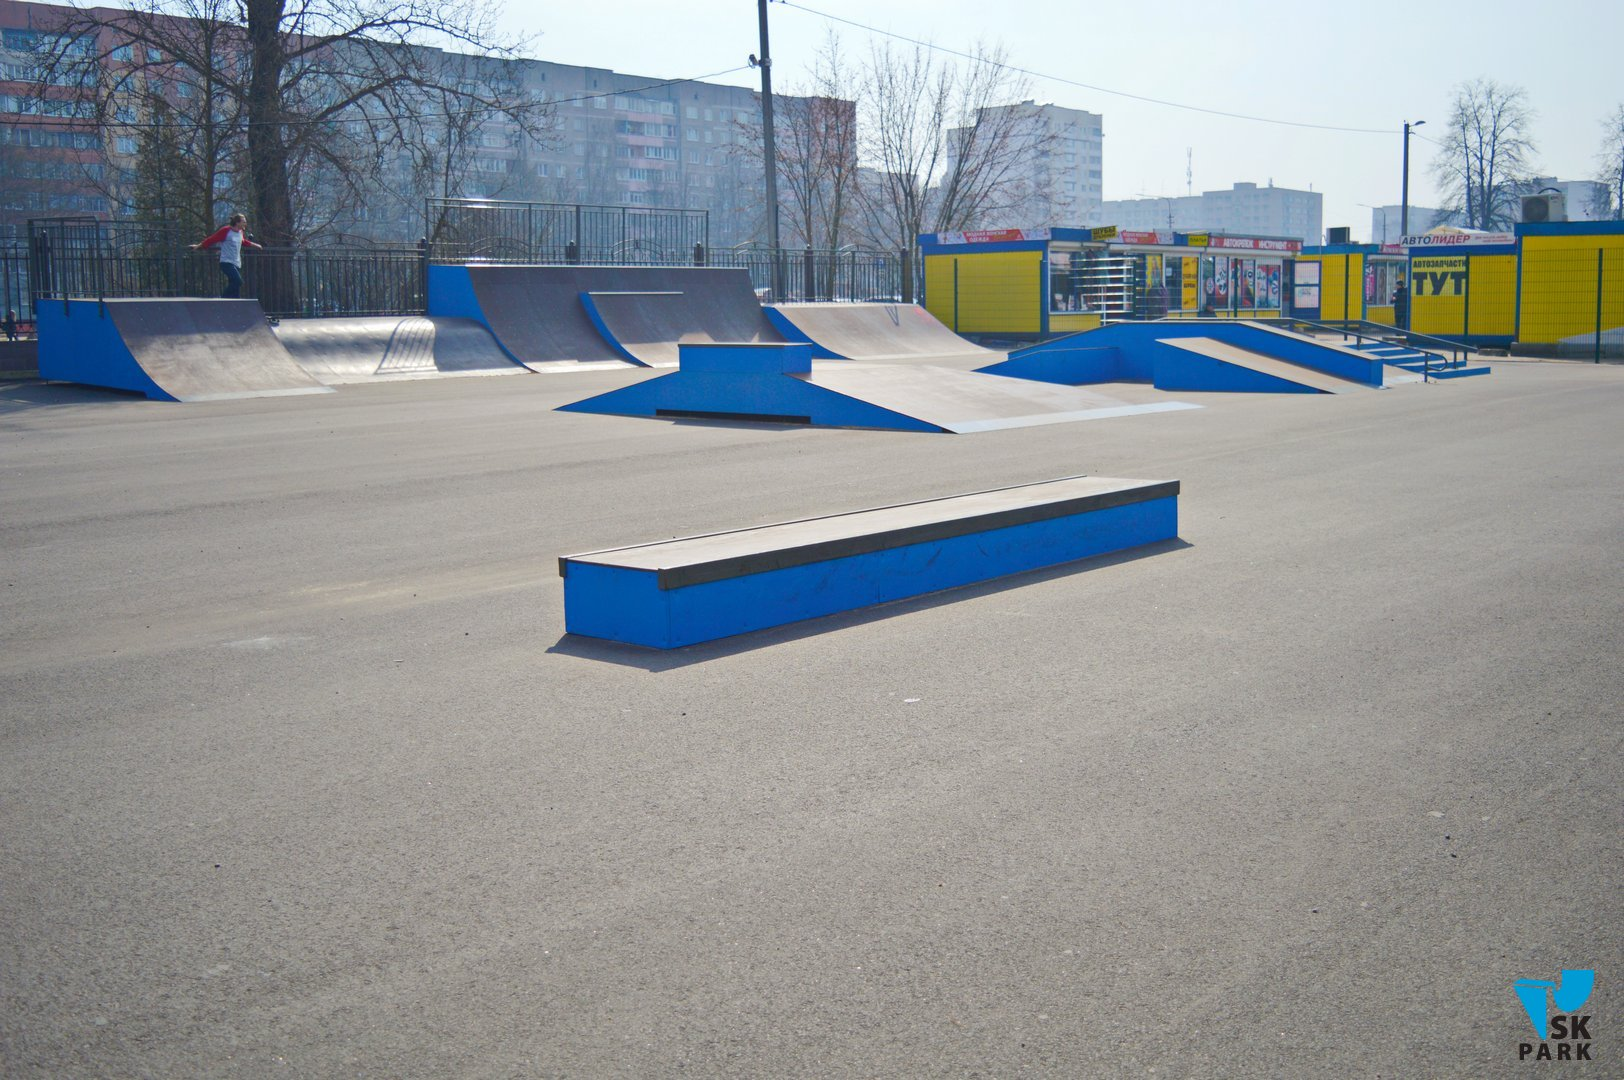 Скейт парк в Борисове, Белоруссия / Skatepark in Borisov